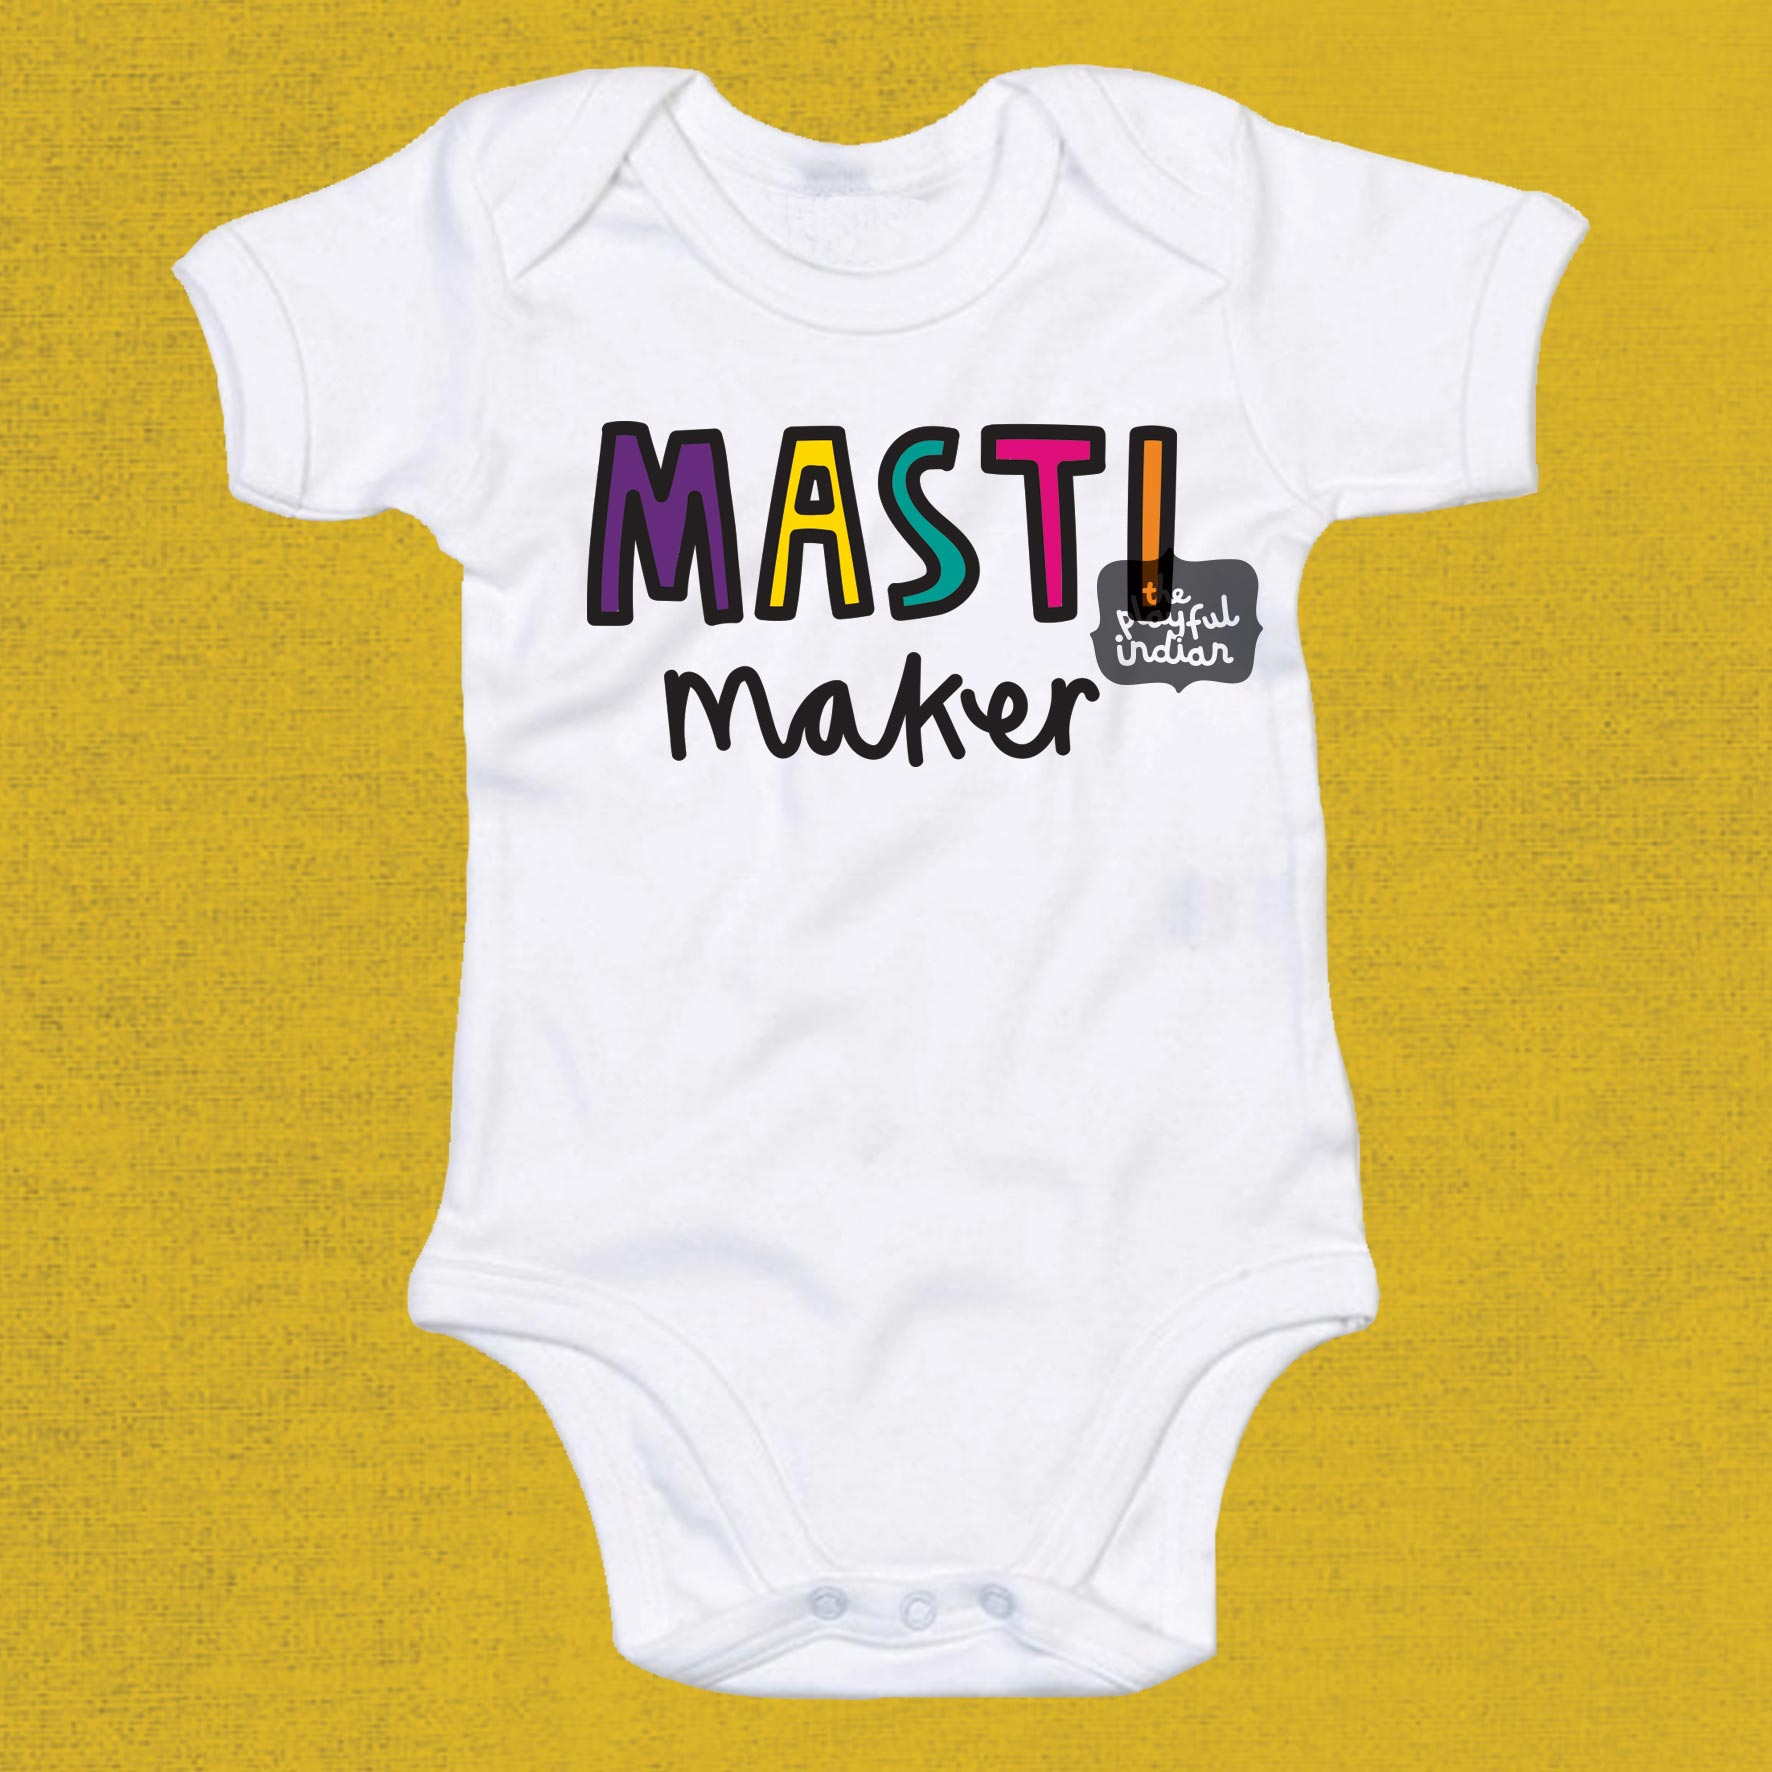 masti maker kids/baby clothing